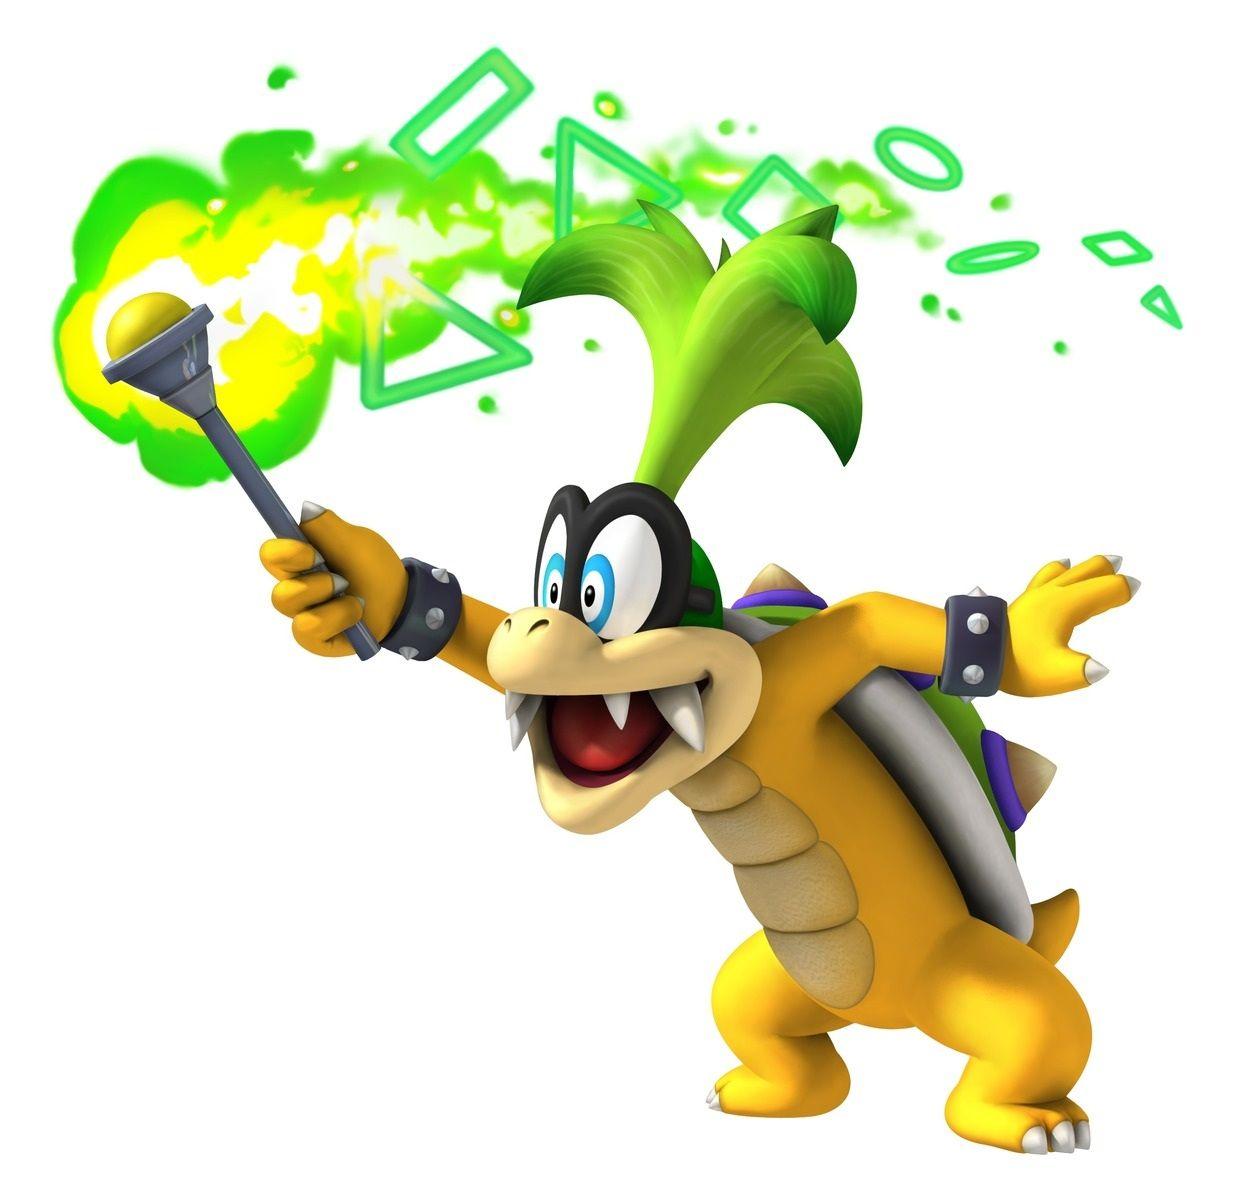 Image Result For Koopa Super Mario 64 Transparent Iggy Mario